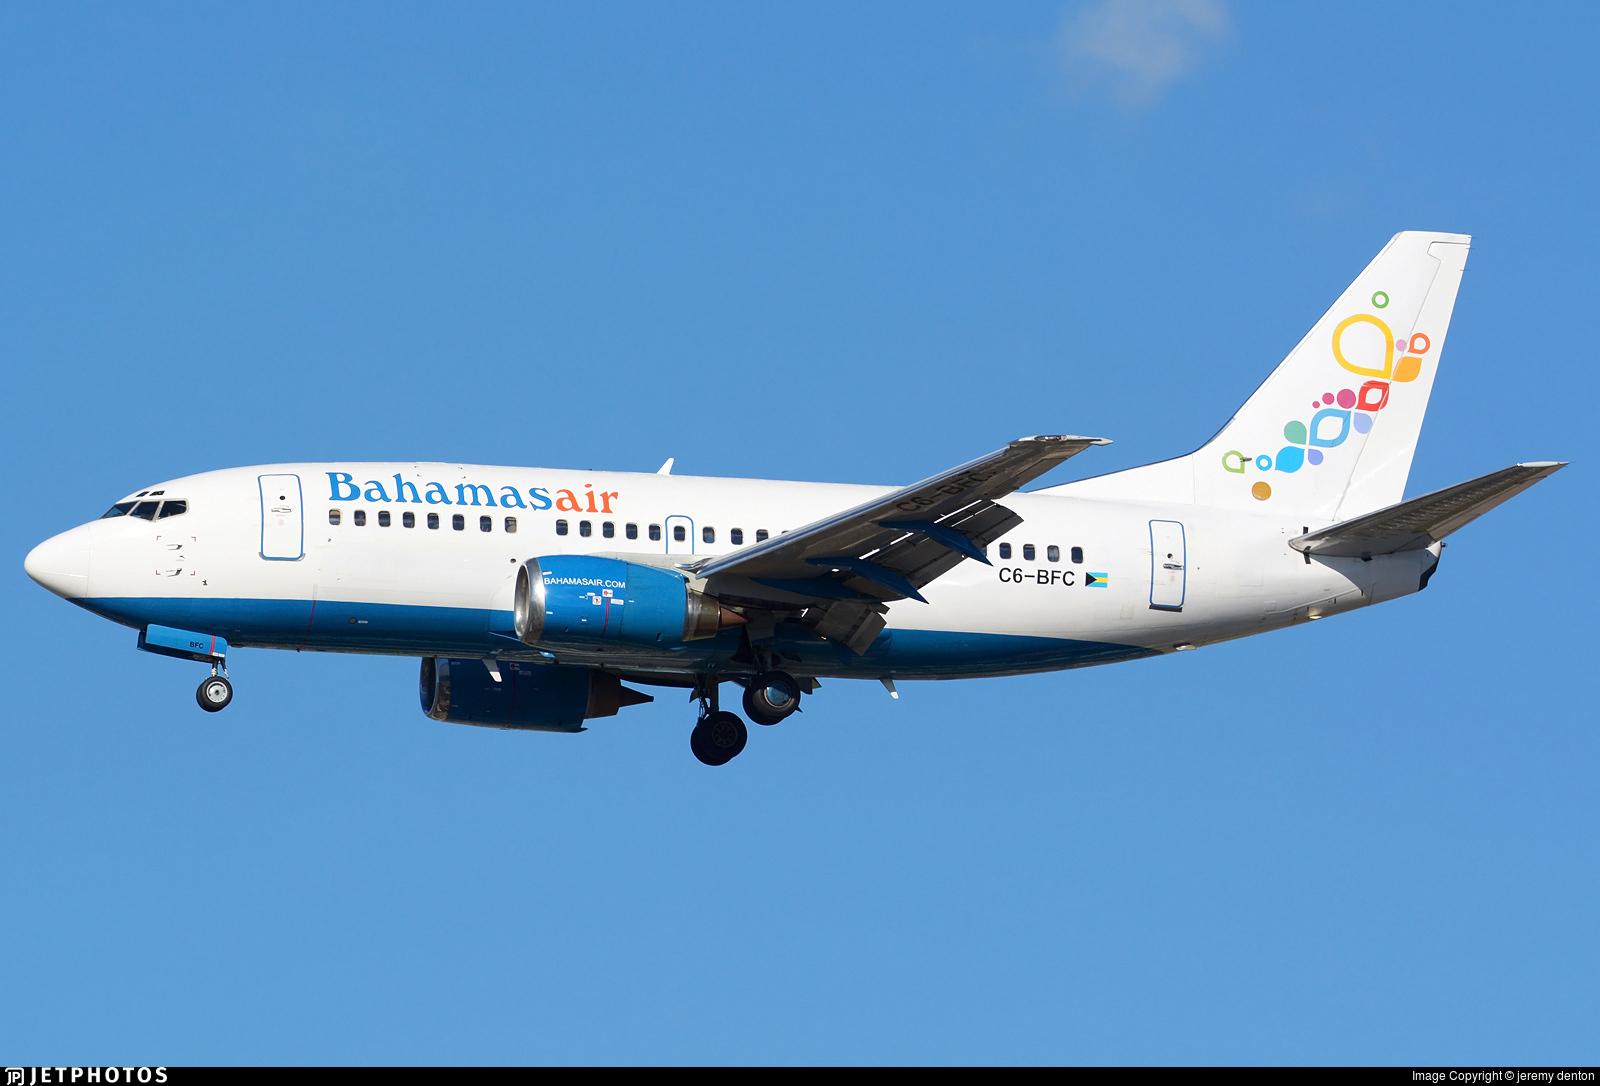 Bahamasair 737-500